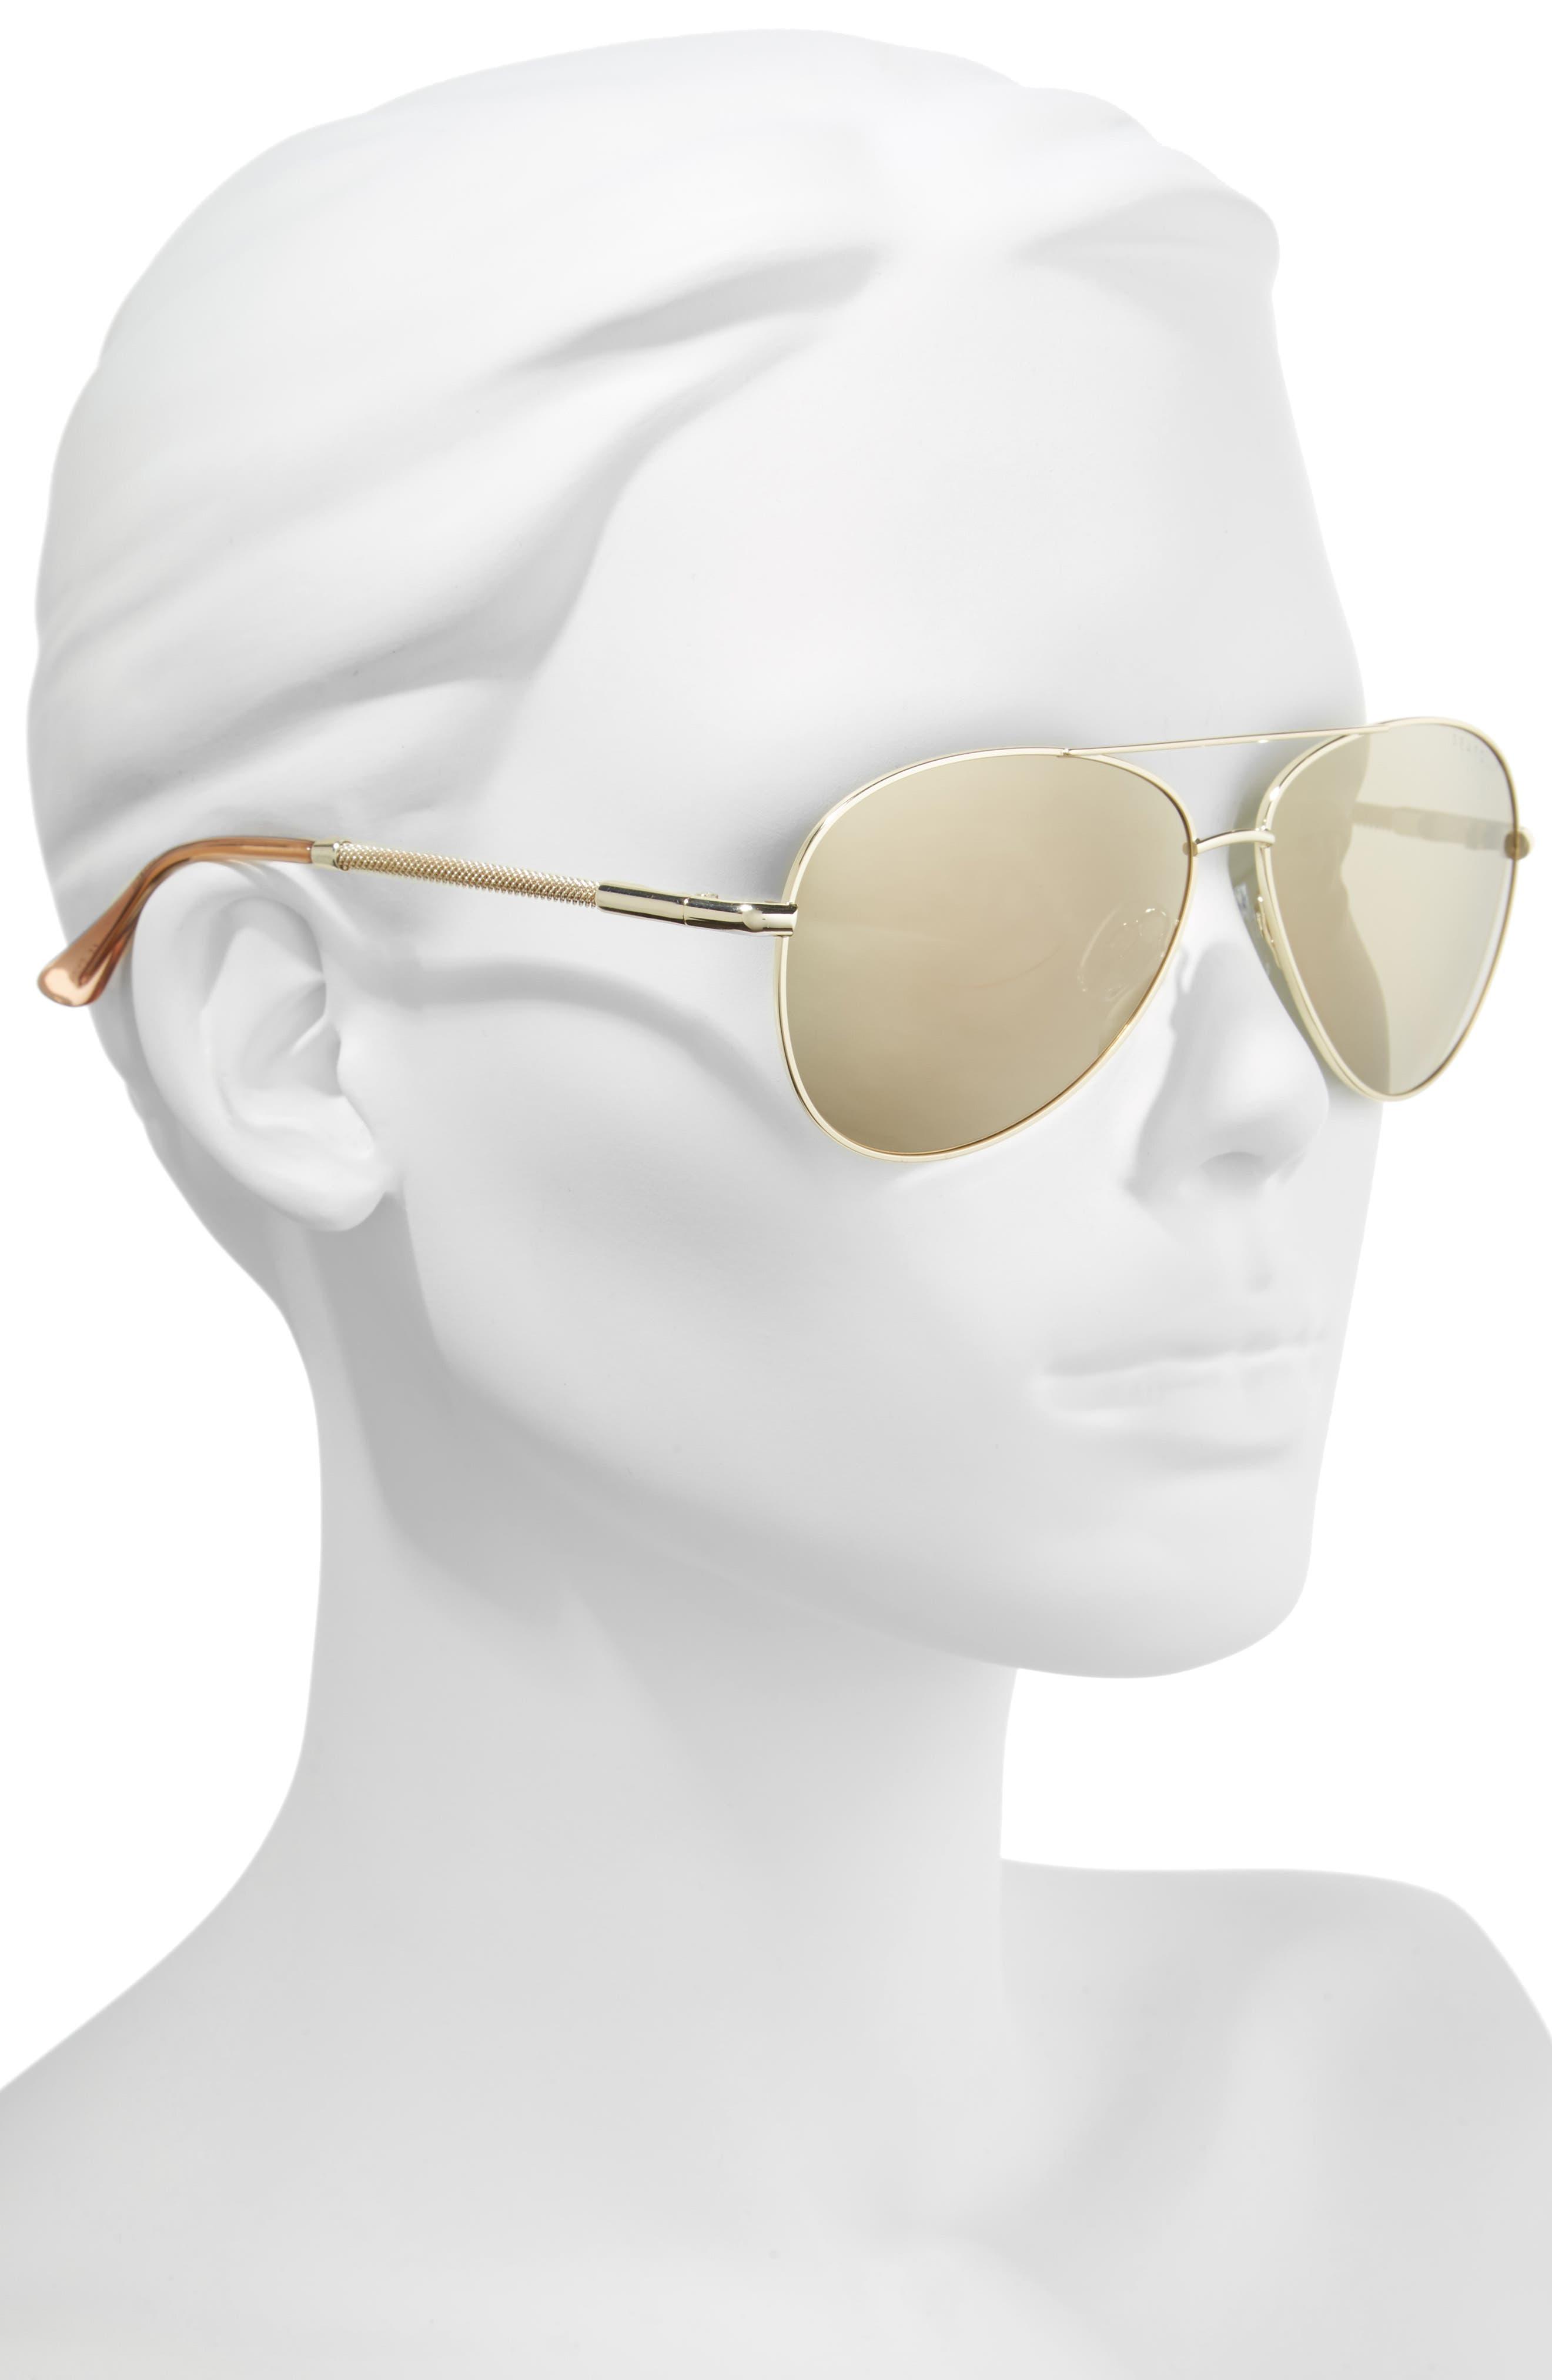 Belize 59mm Aviator Sunglasses,                             Alternate thumbnail 2, color,                             710